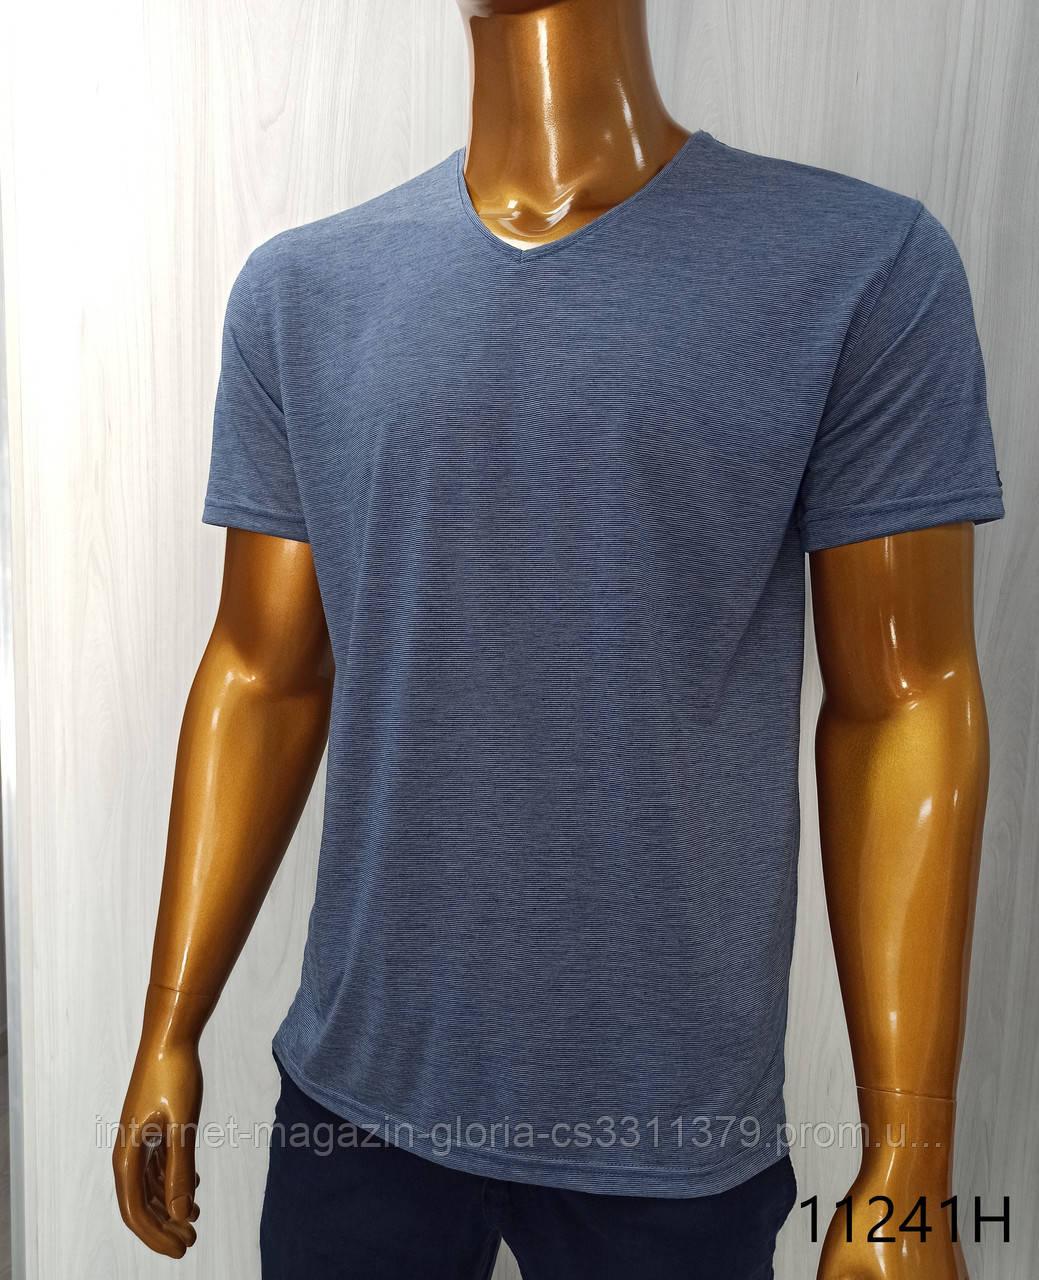 Мужская футболка MSY. 11241-8361(blue). Размеры: M,L,XL,XXL.